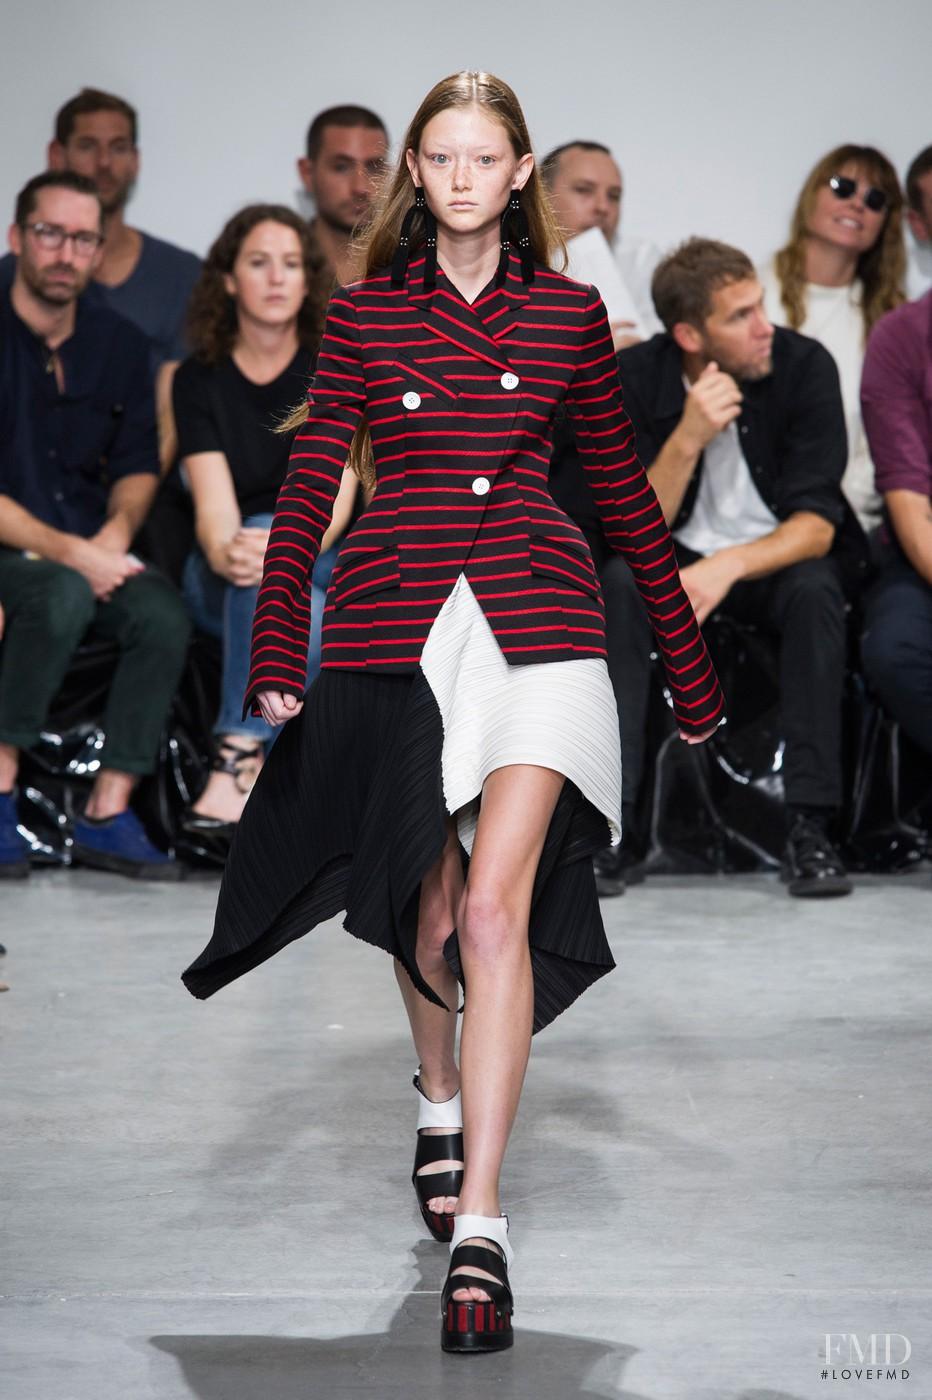 Streaker at fashion week 18